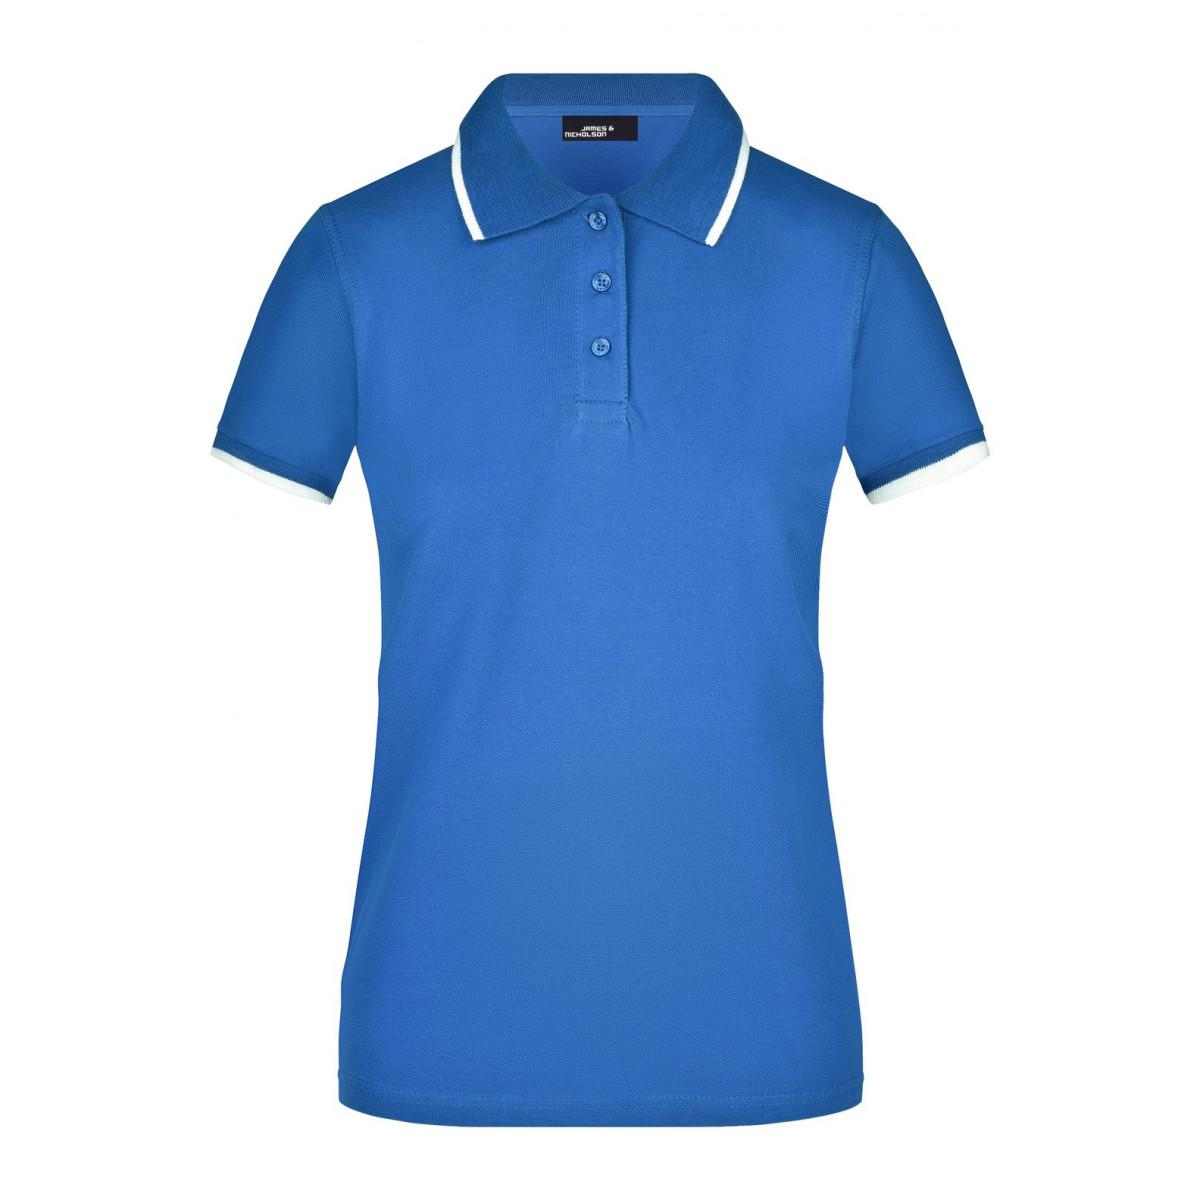 Рубашка поло женская JN934 Ladies Polo Tipping - Ярко-синий/Белый